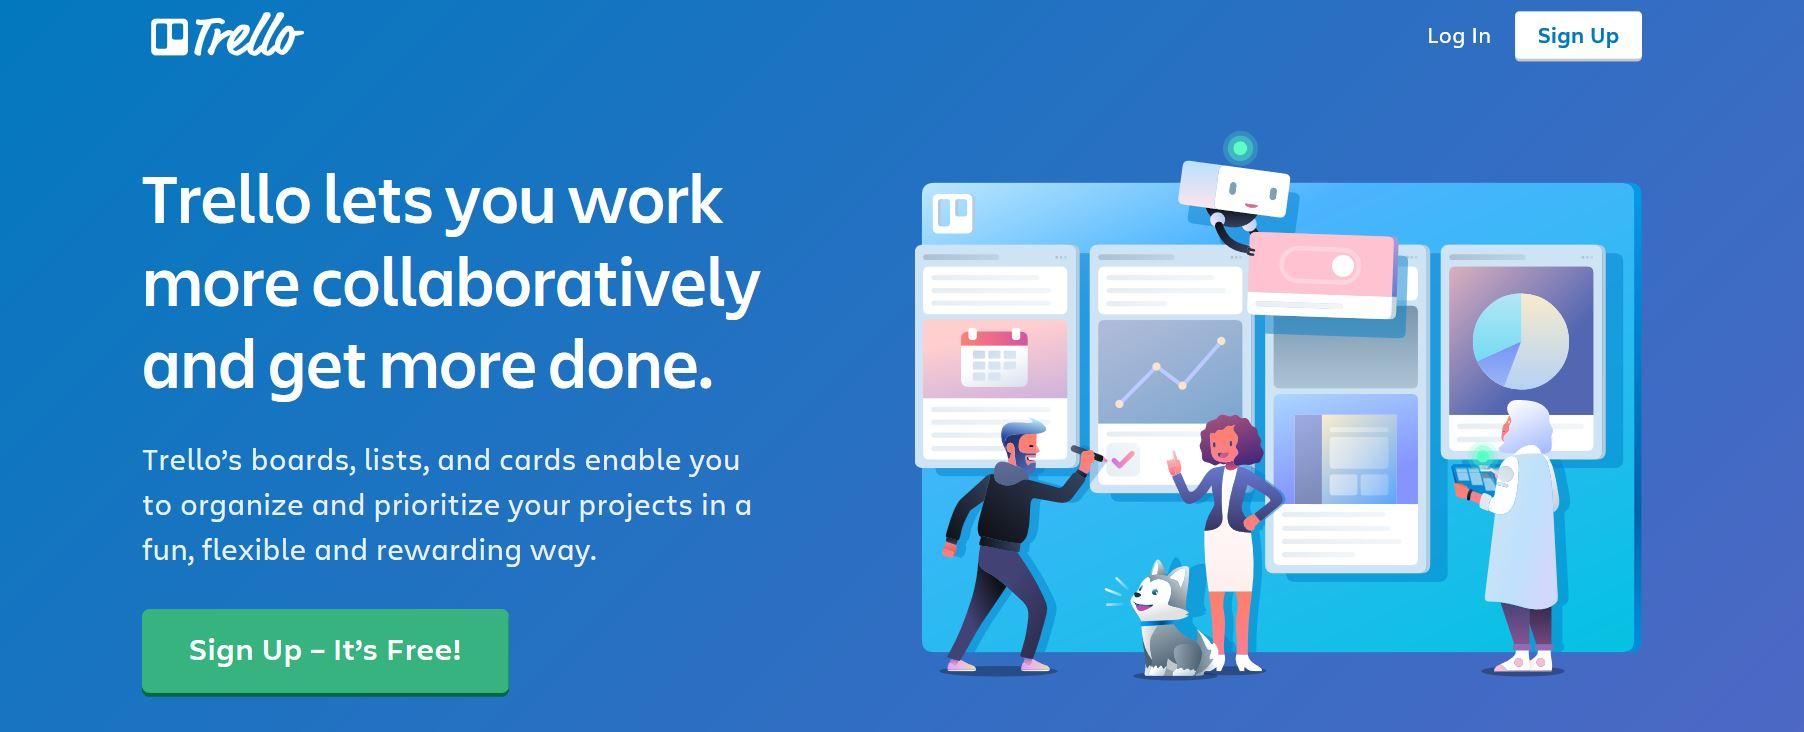 Screenshot of Trello website